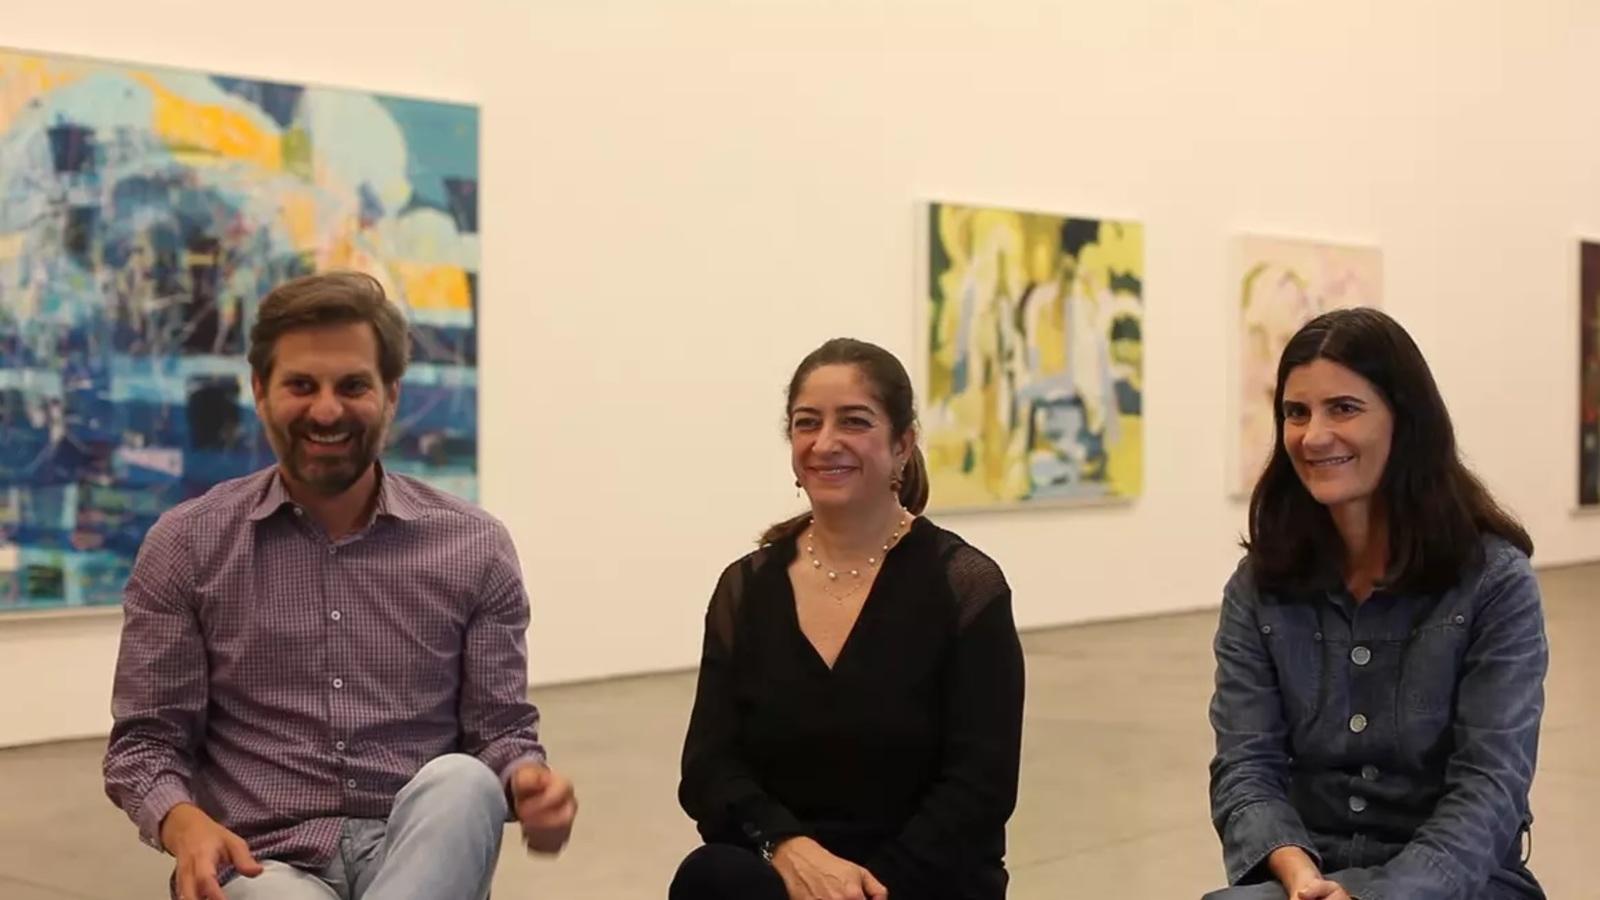 Márcia Fortes, Alessandra D'Aloia and Alexandre Gabriel